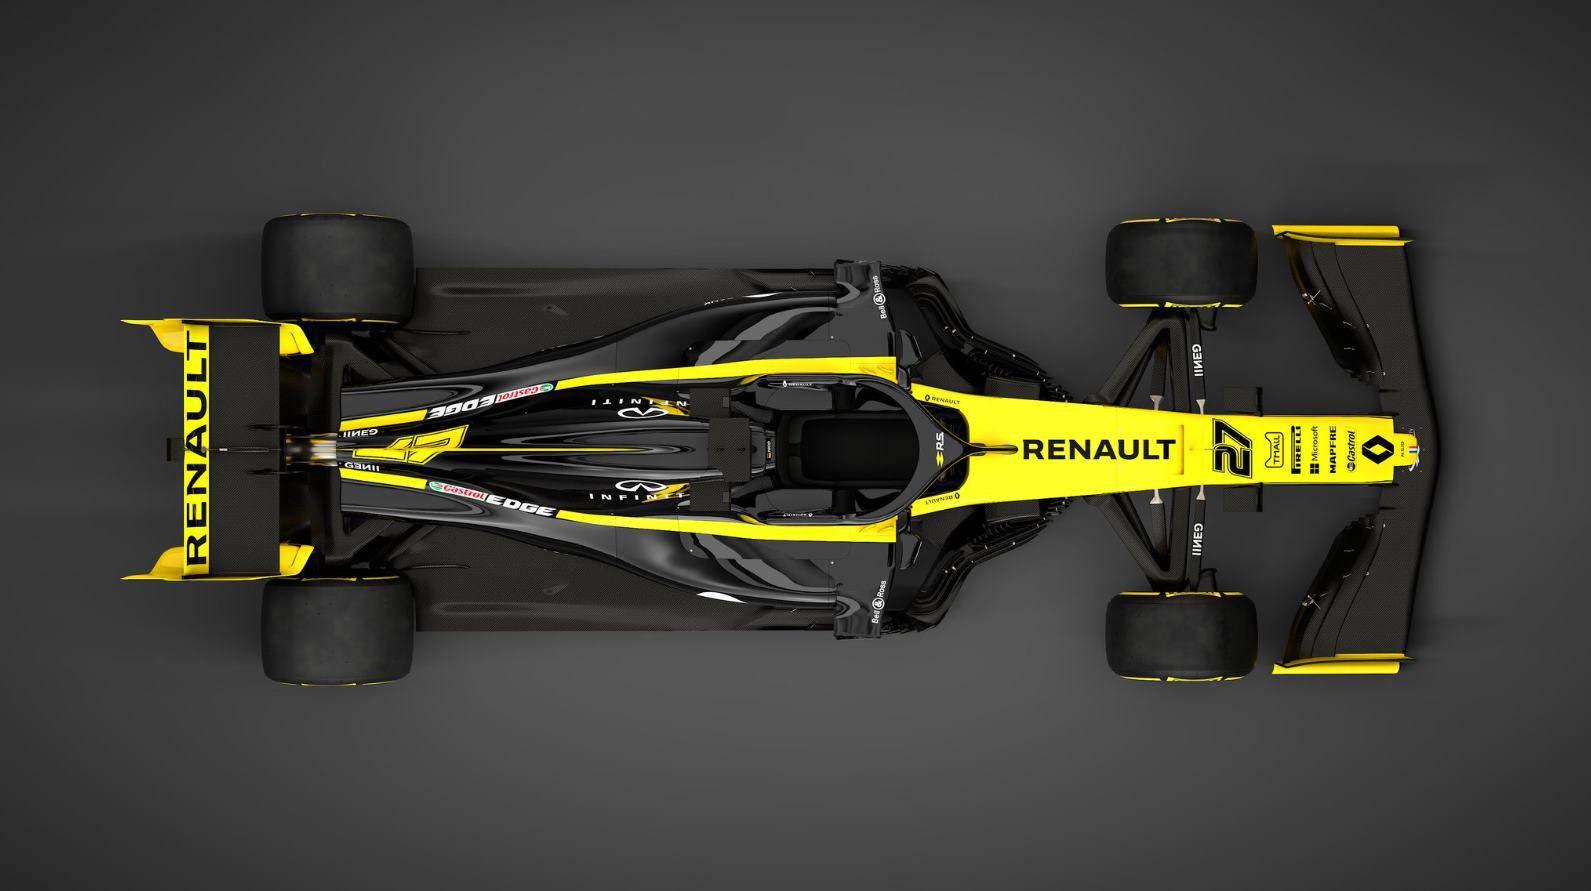 Renault RS19 Twitter Renault Sport F1 top MAXF1net